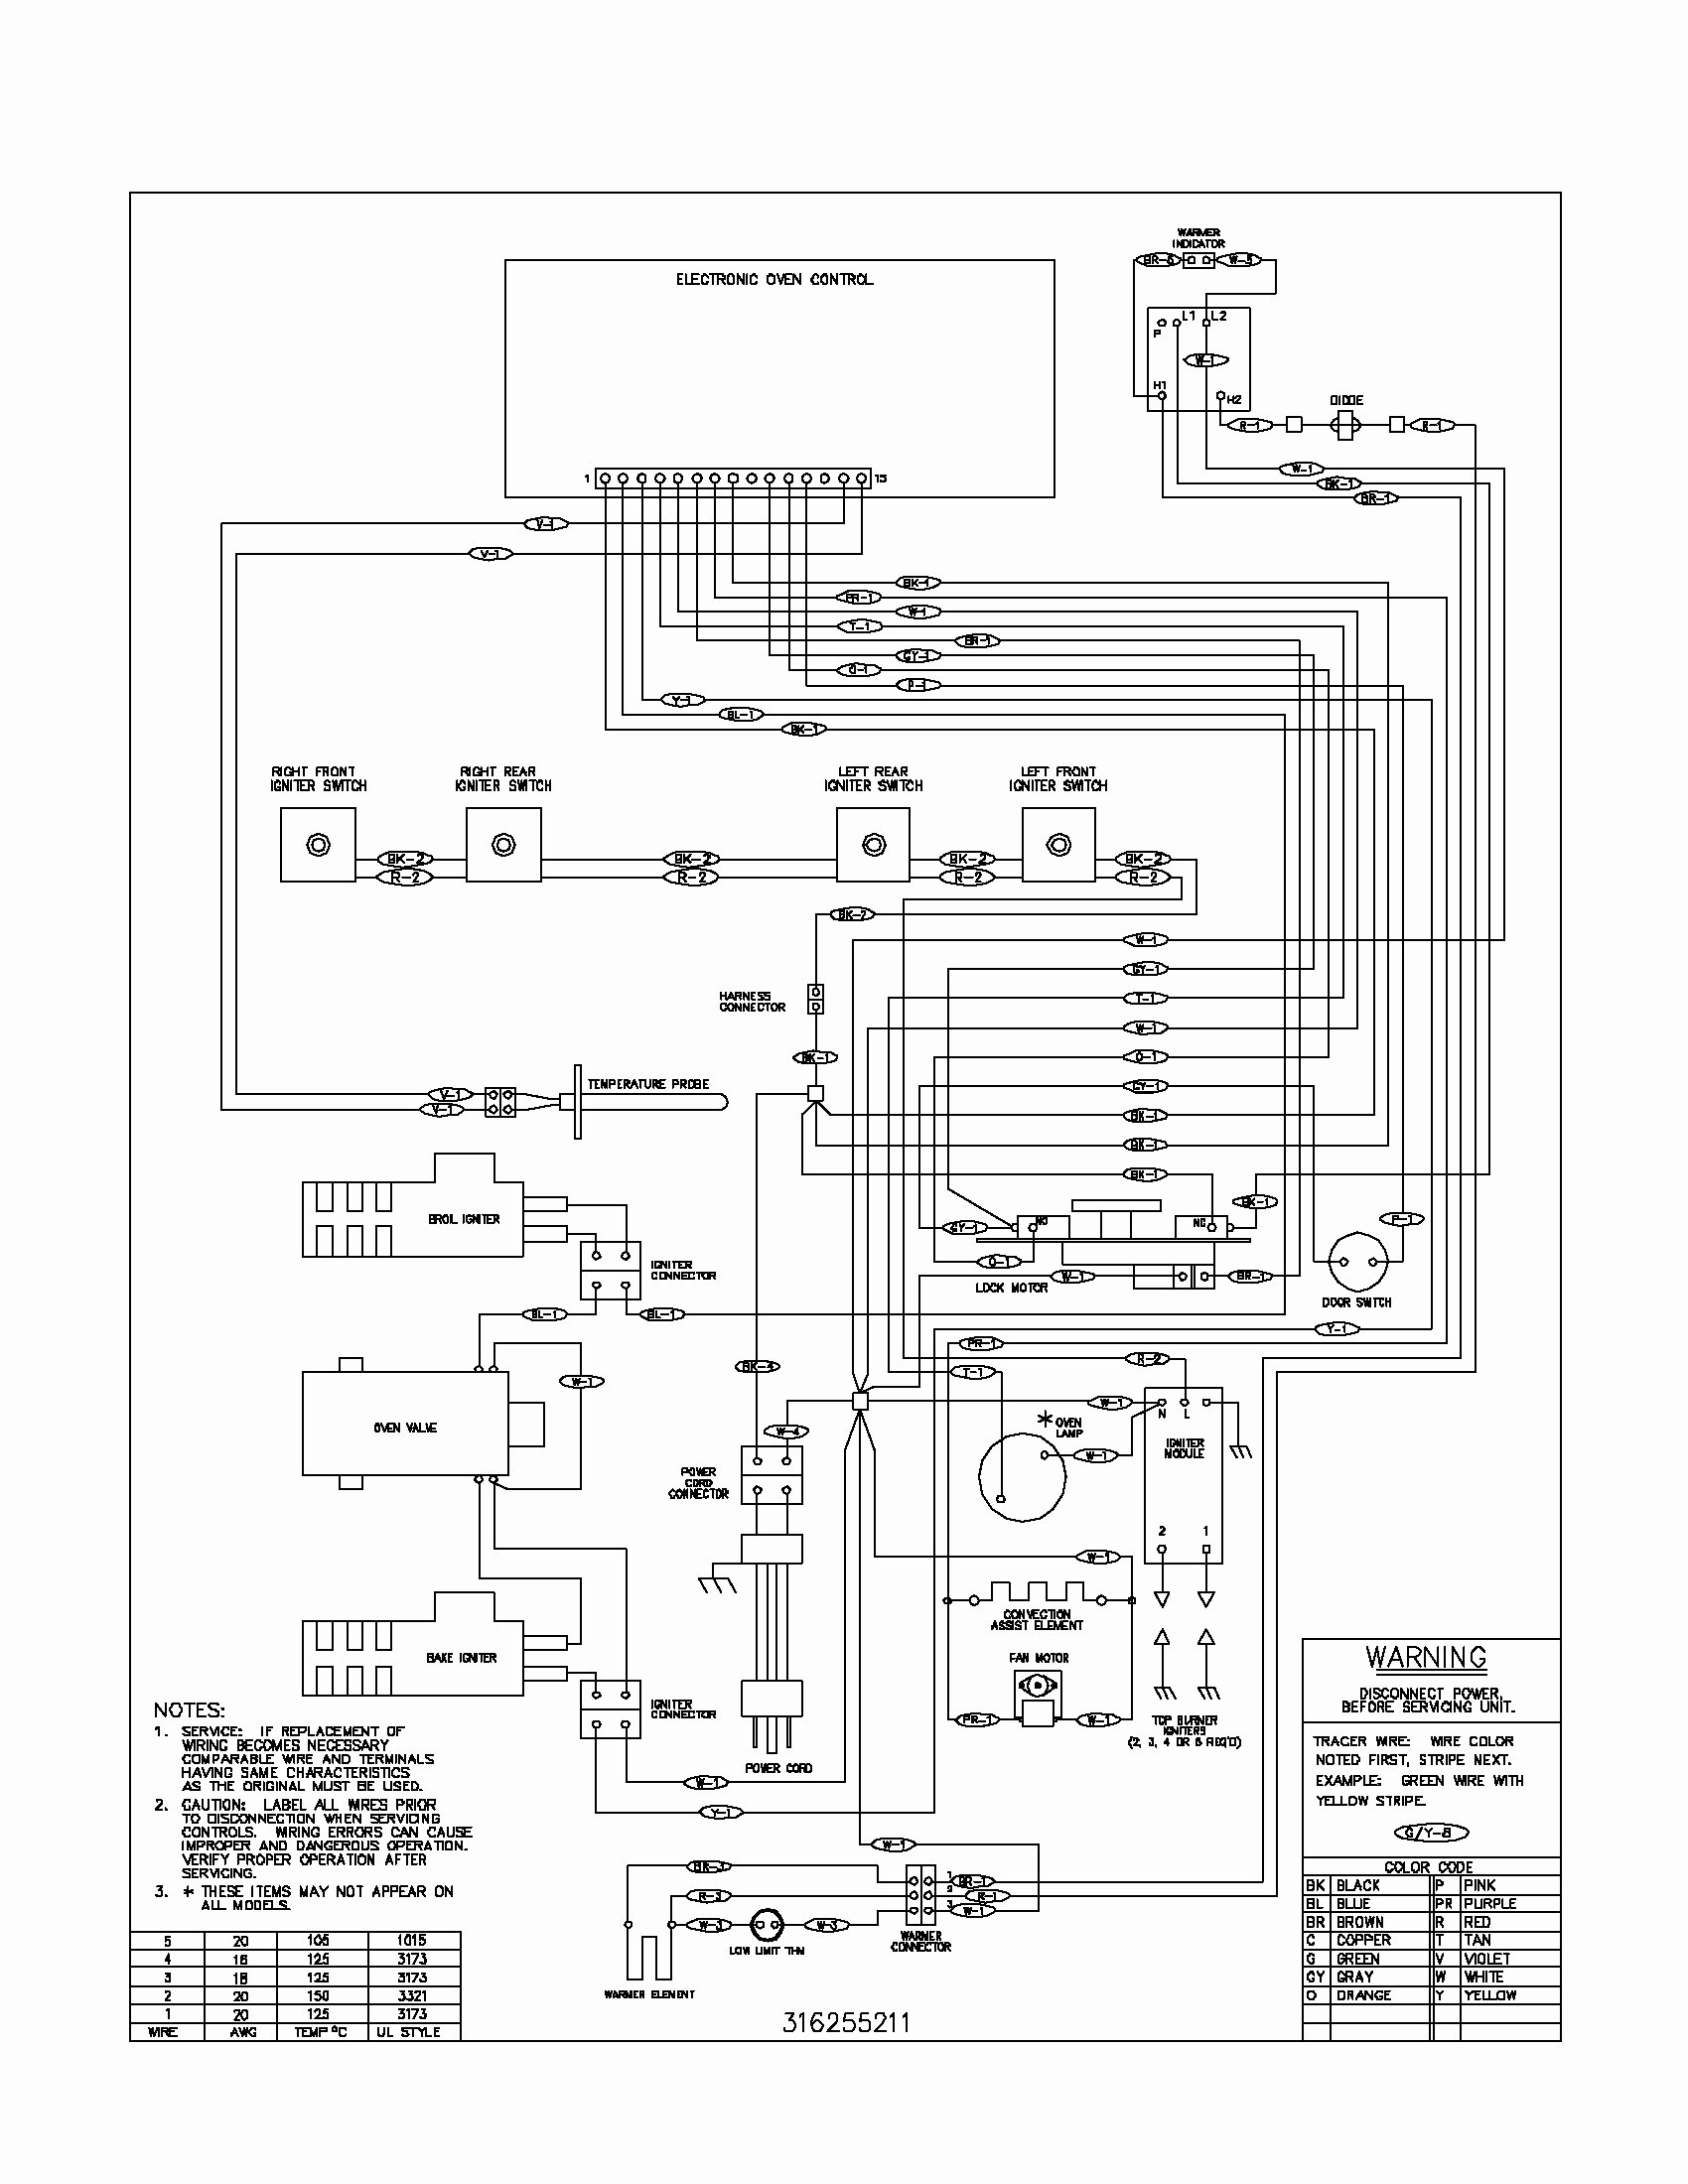 diy powder coating oven wiring diagram free wiring diagramdiy powder coating oven wiring diagram powder coat